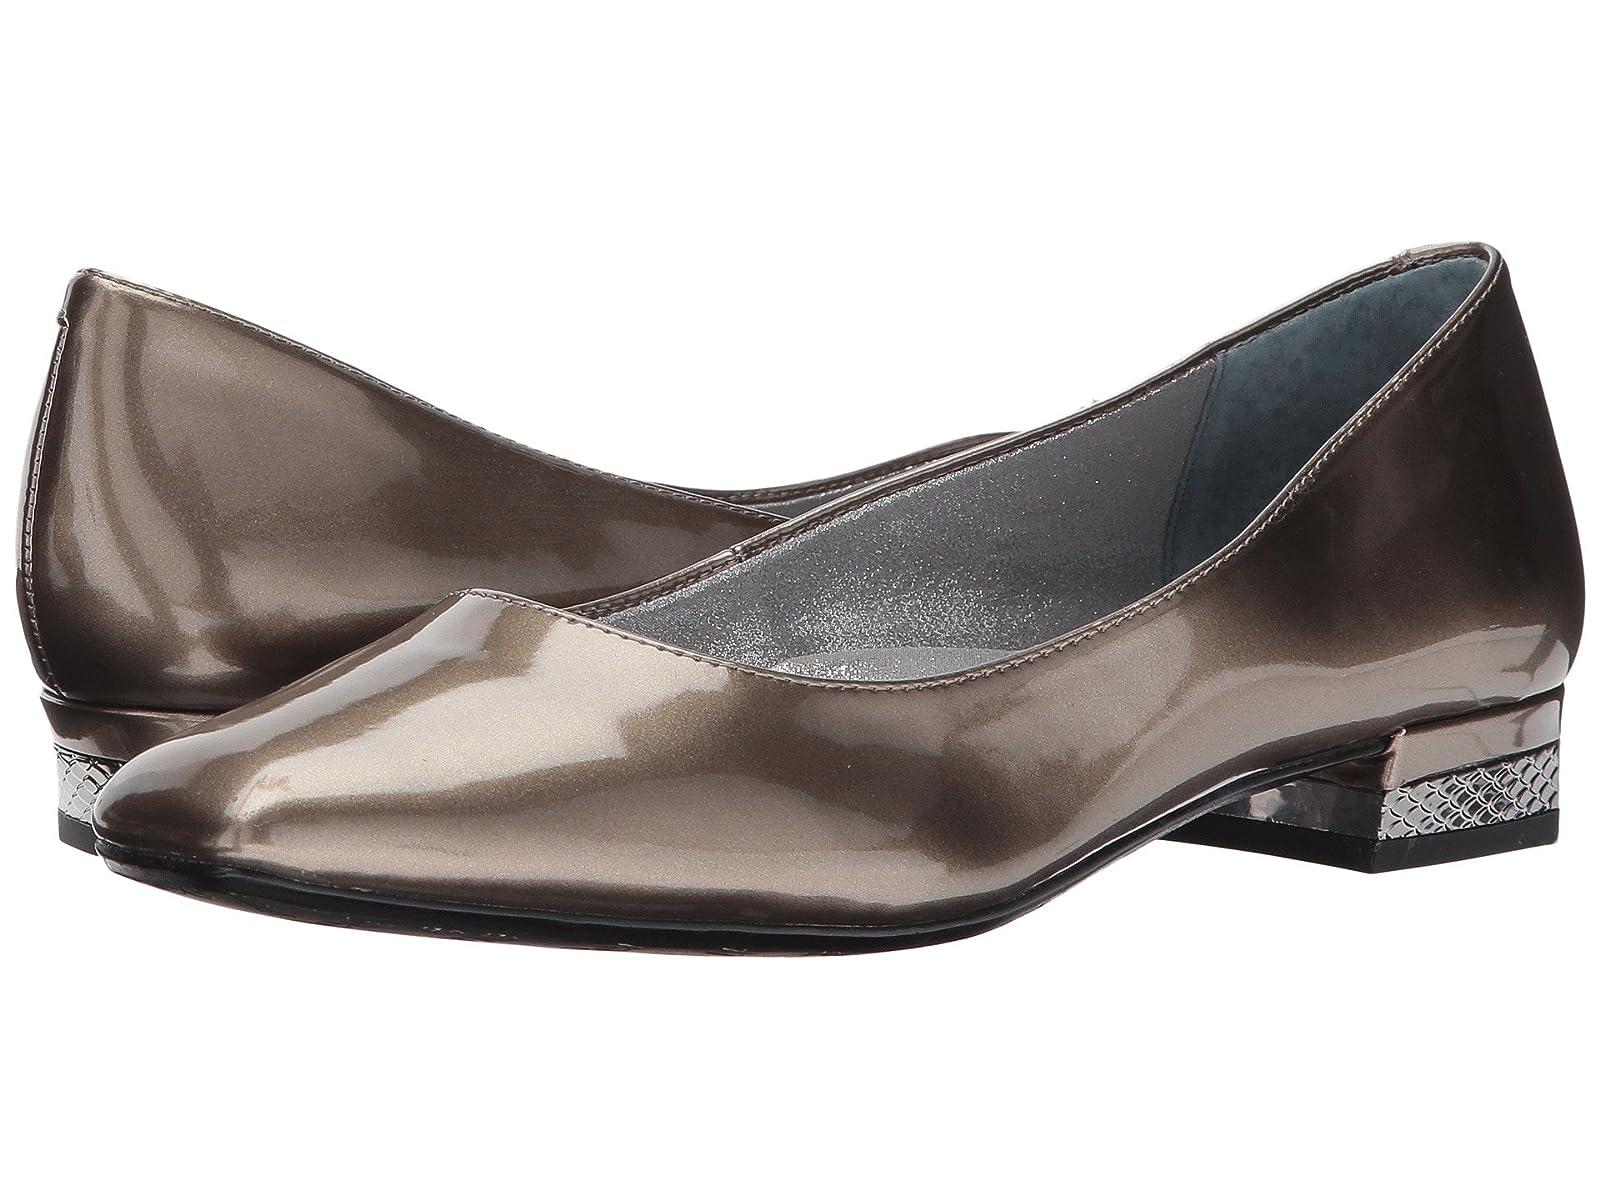 J. Renee EleadoraCheap and distinctive eye-catching shoes